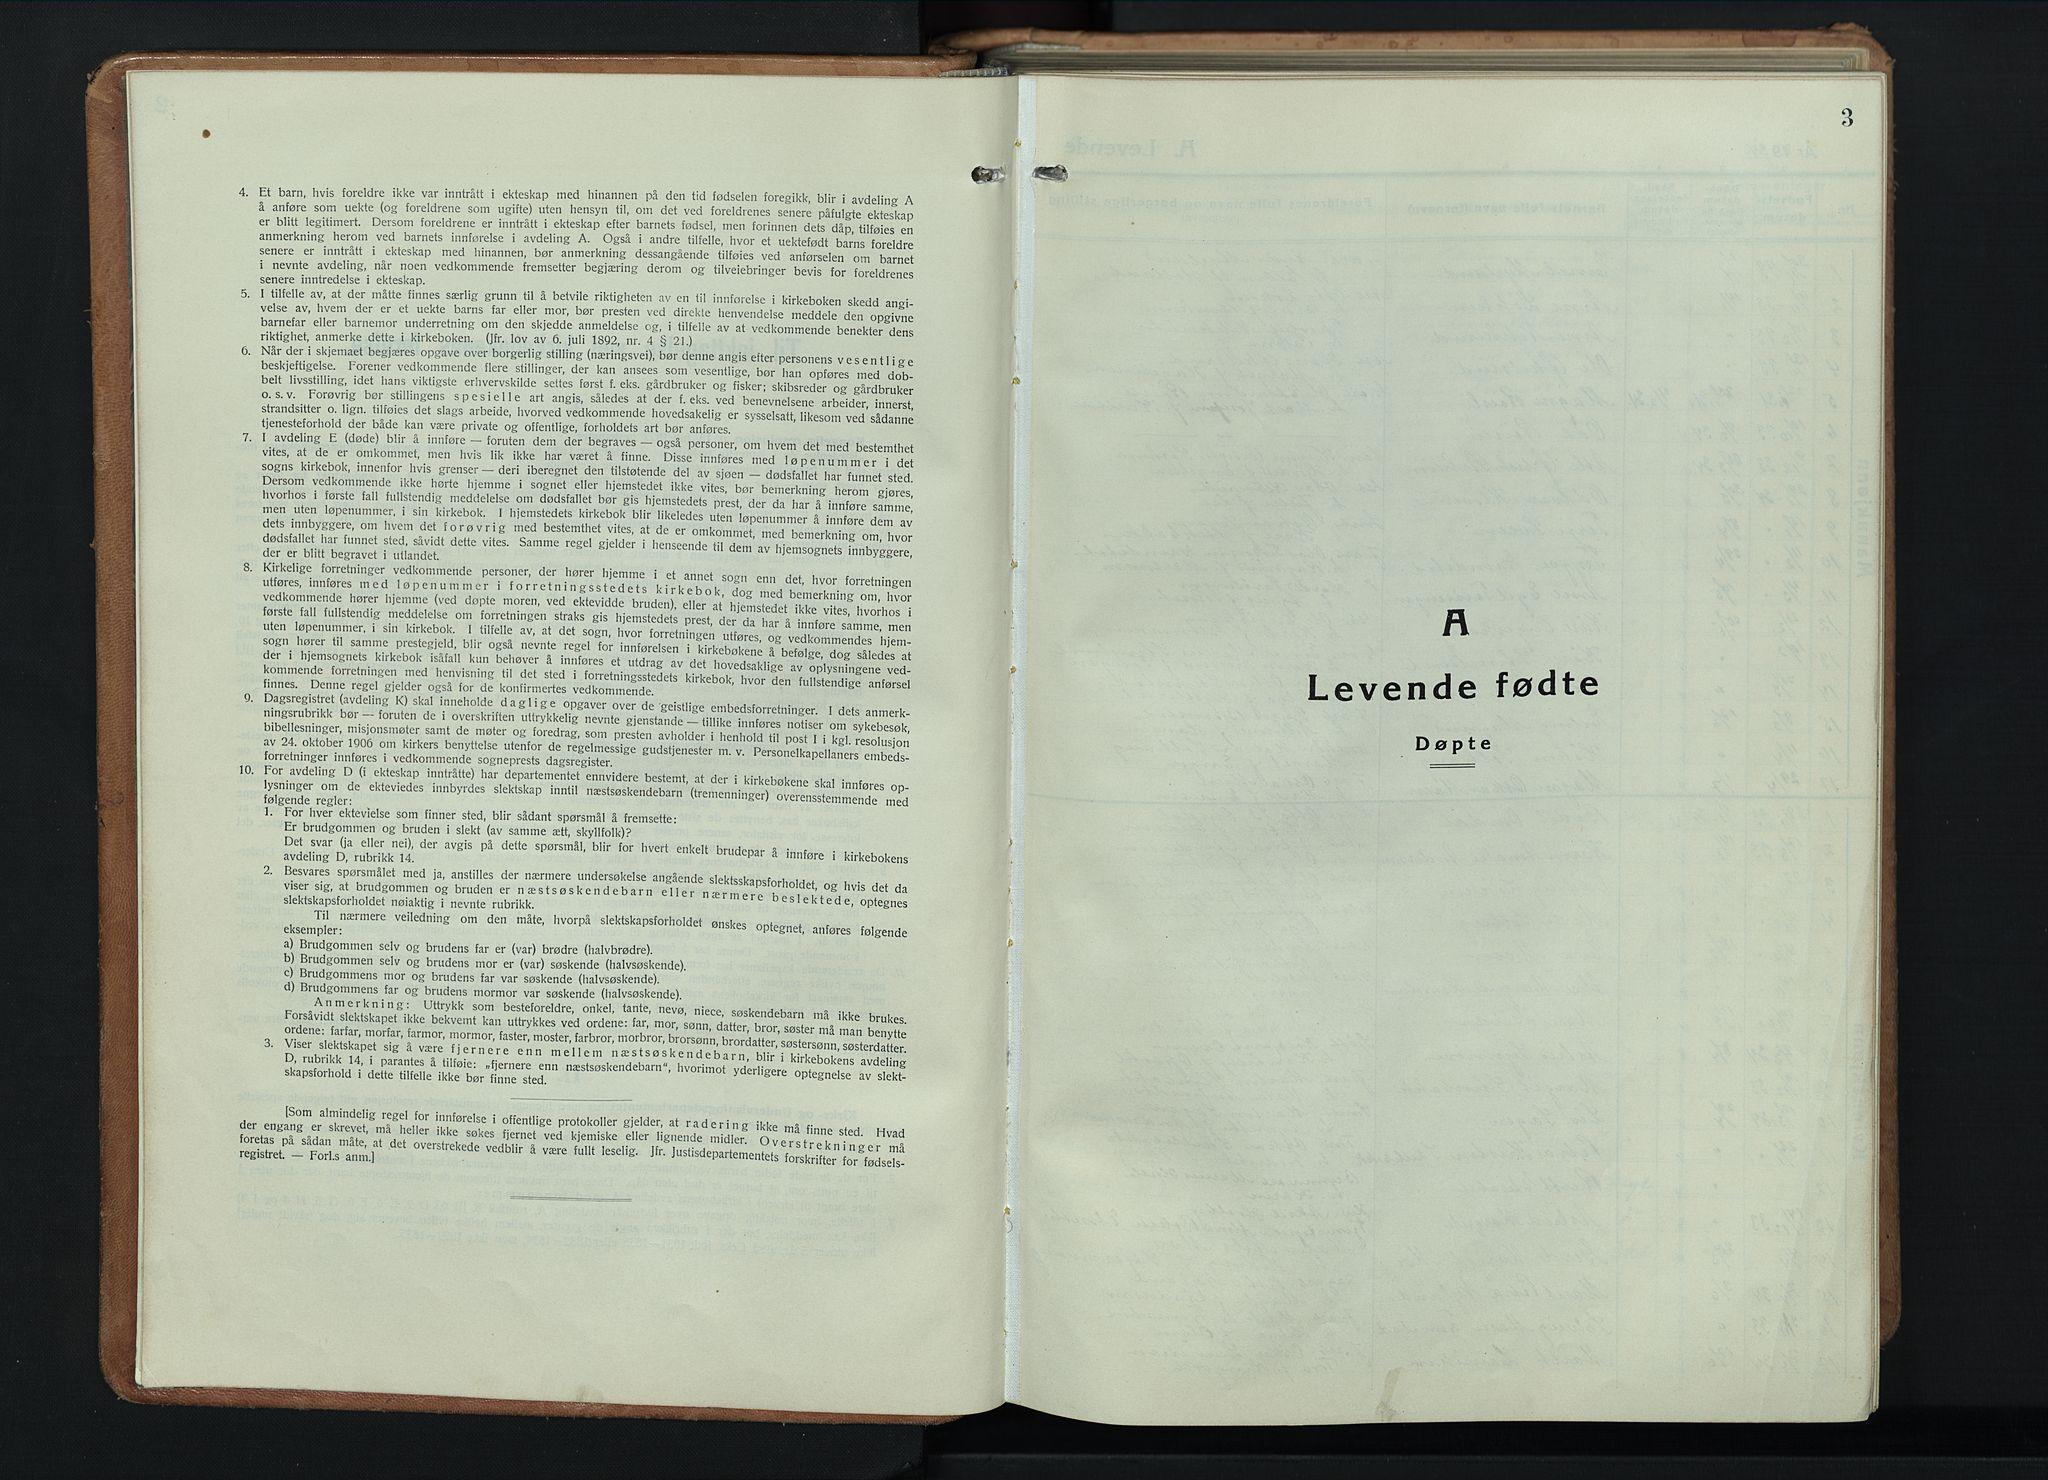 SAH, Østre Toten prestekontor, Klokkerbok nr. 11, 1934-1952, s. 3